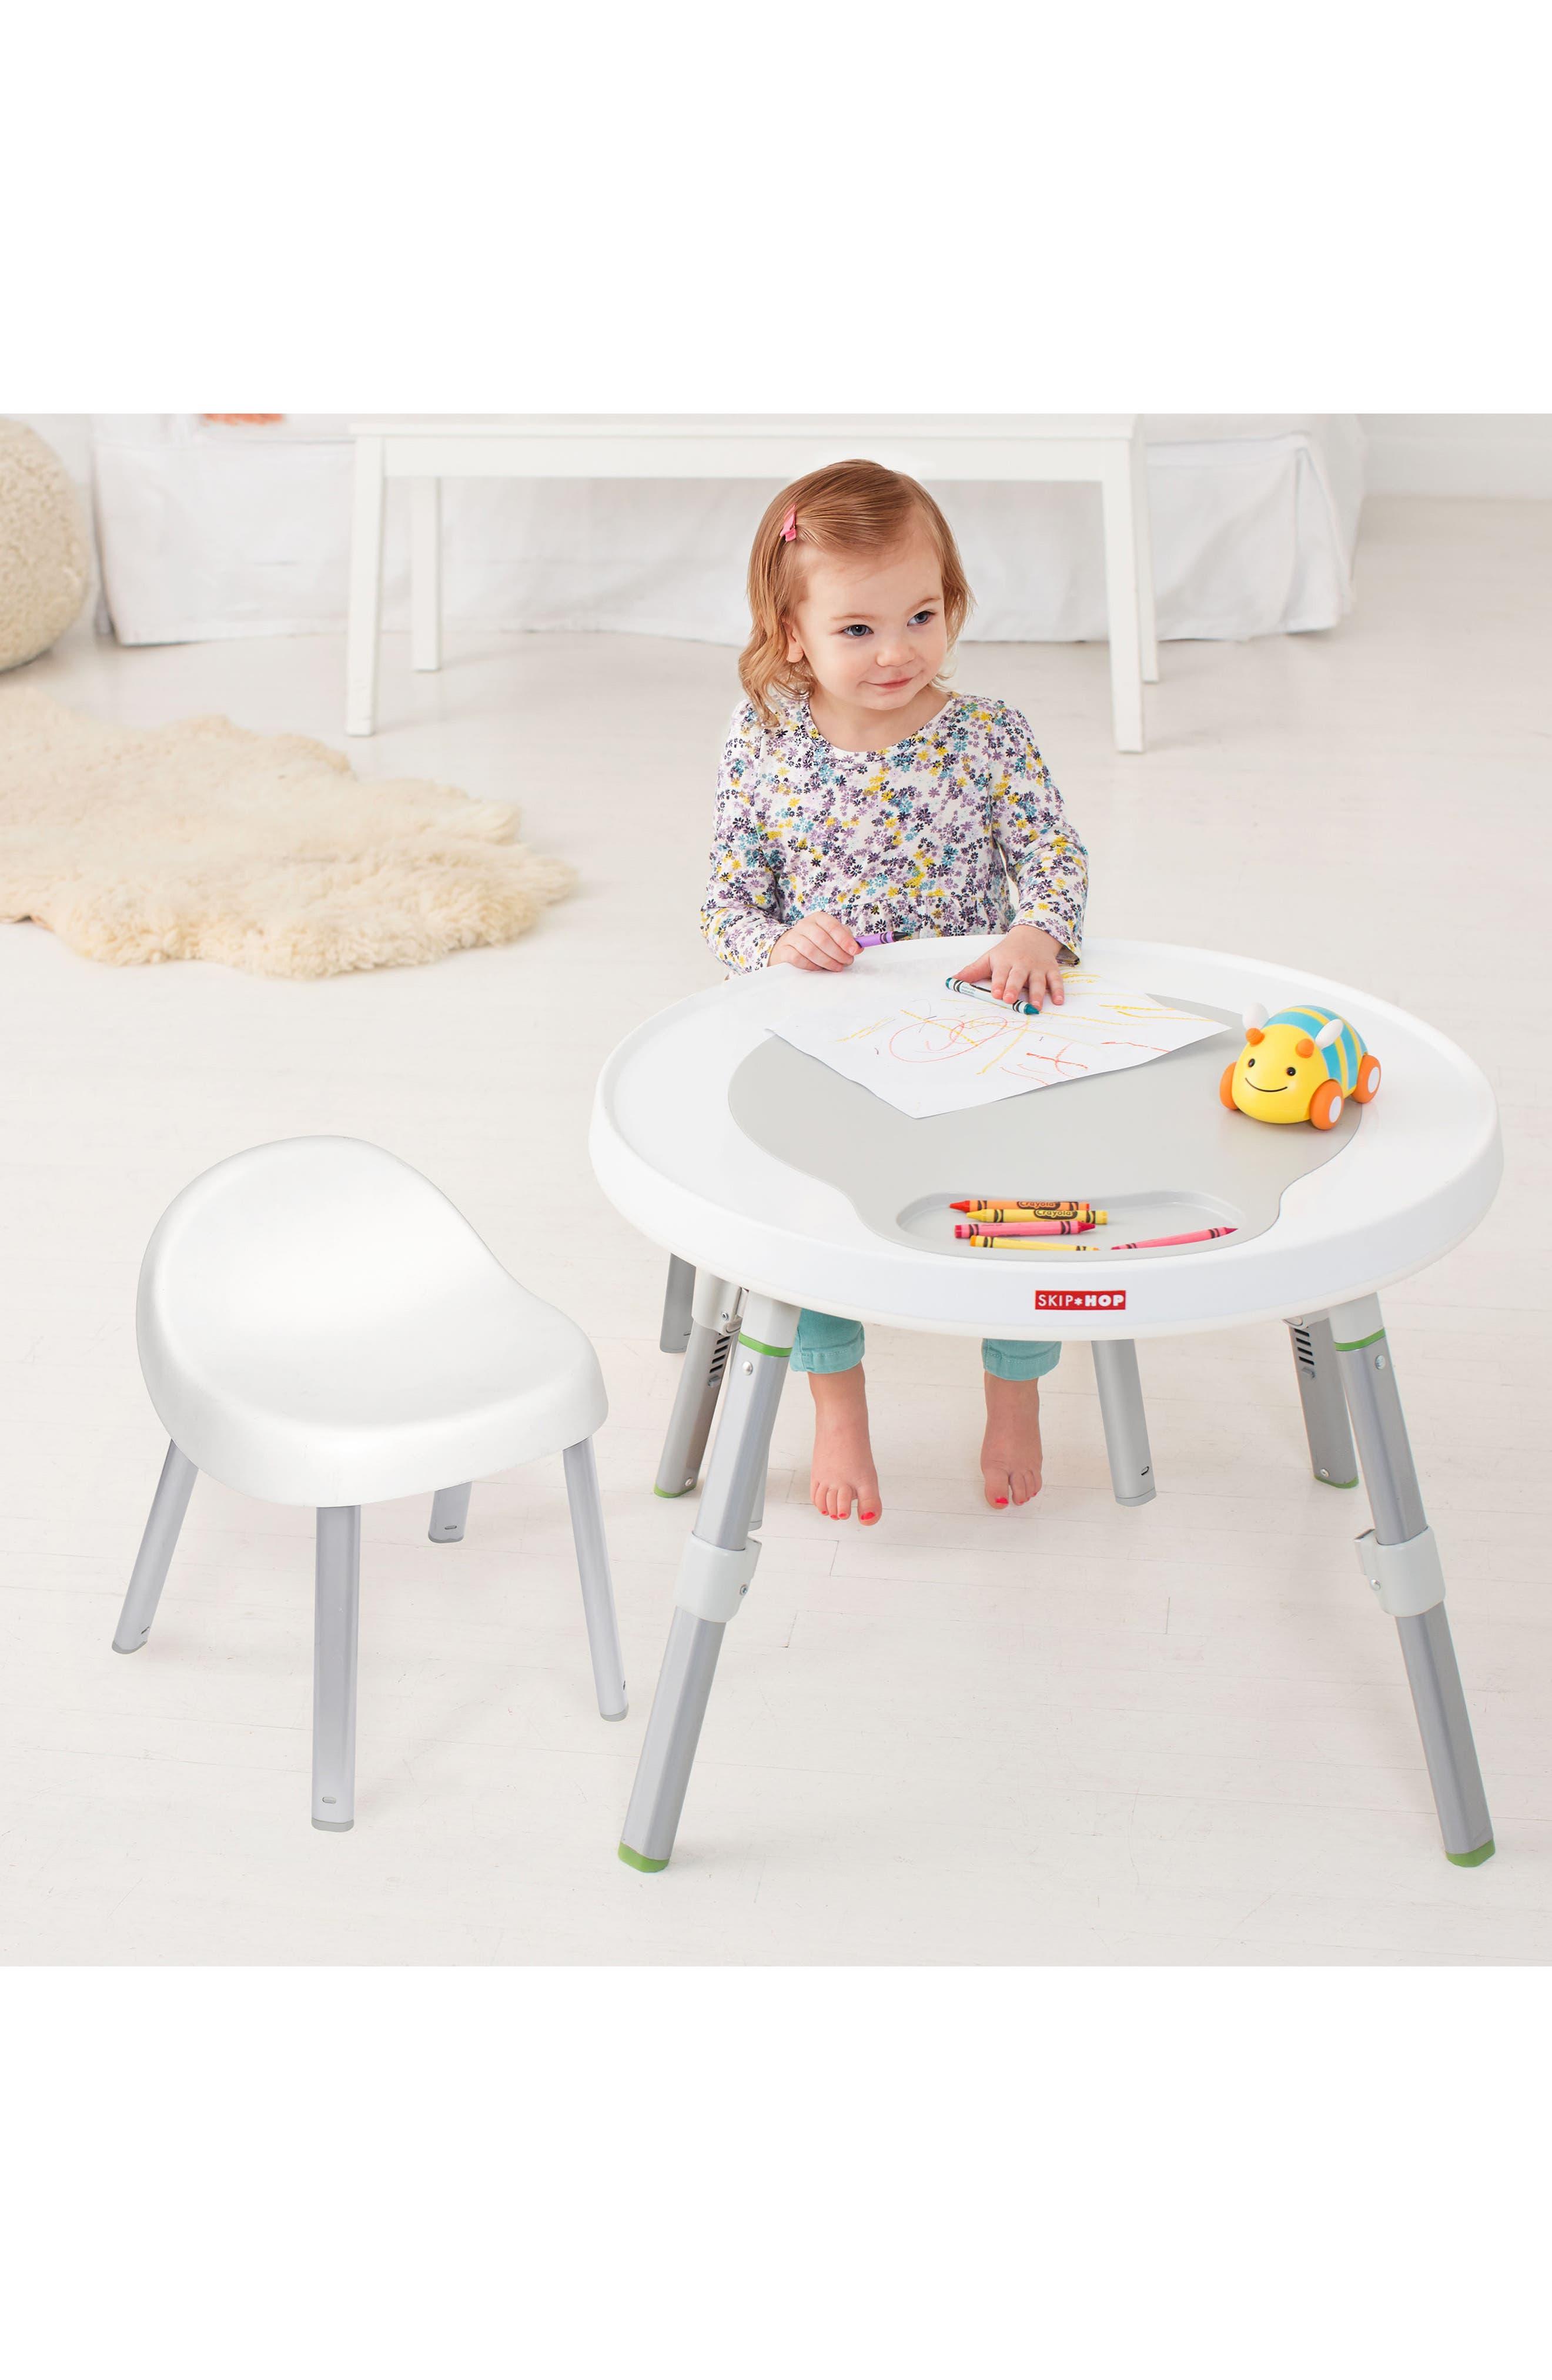 Explore & More Kids' Chairs,                             Alternate thumbnail 3, color,                             WHITE